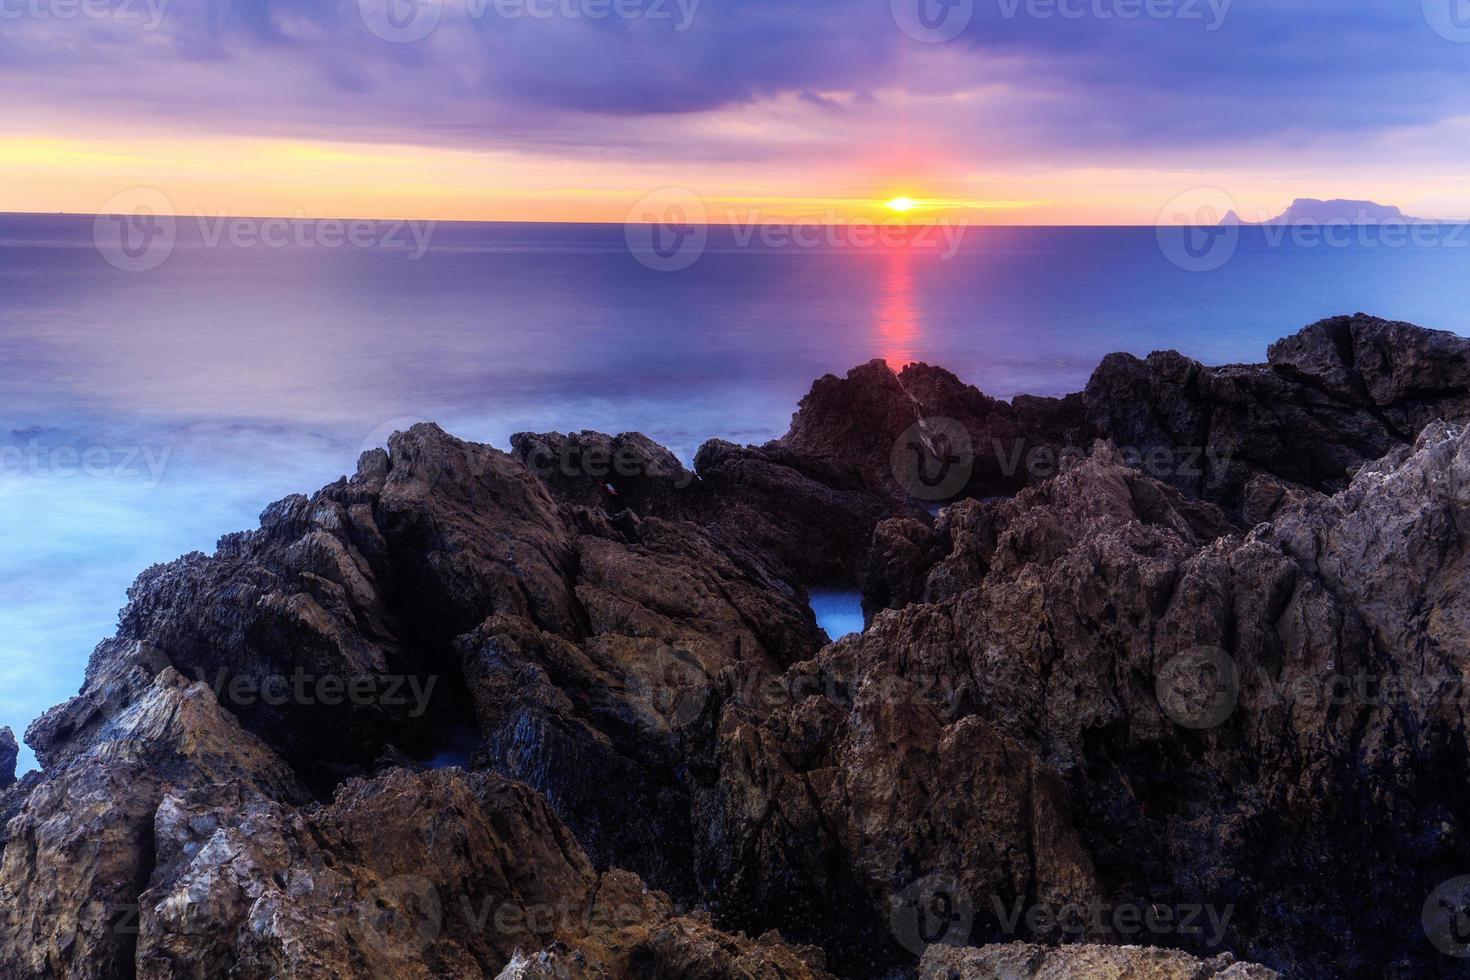 Sonnenaufgang an der Küste foto